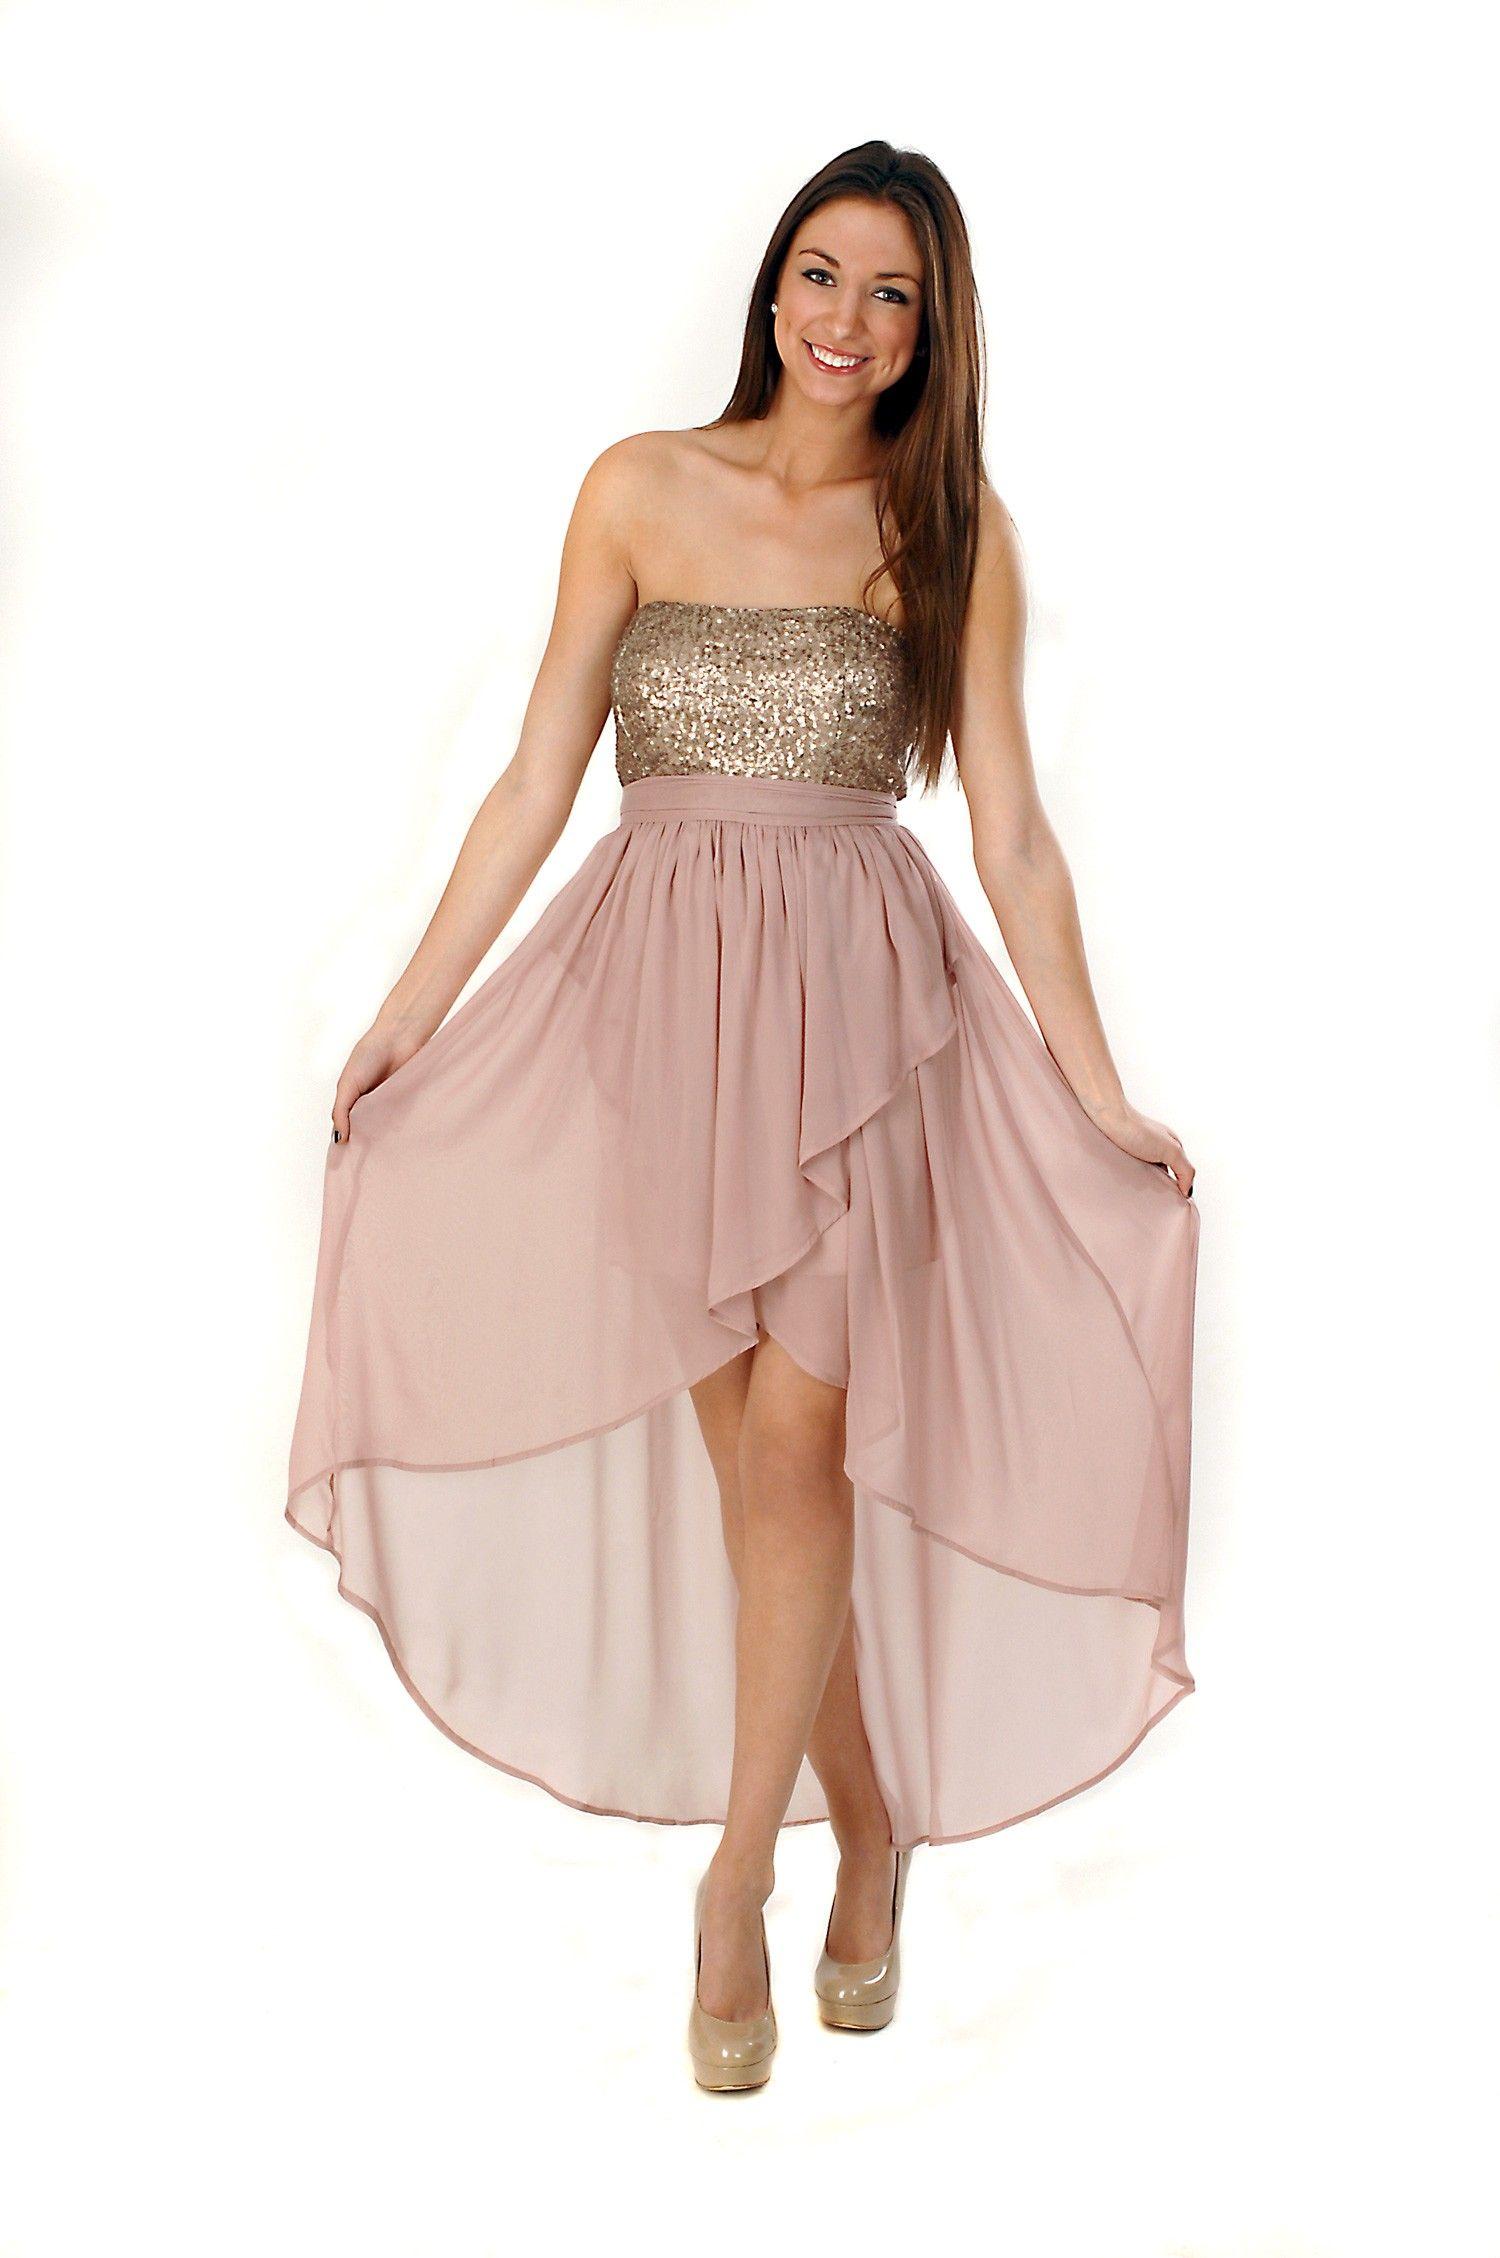 ROSE AND GOLD SEQUIN HI LOW DRESS | DRESSES | Pinterest | Sequins ...